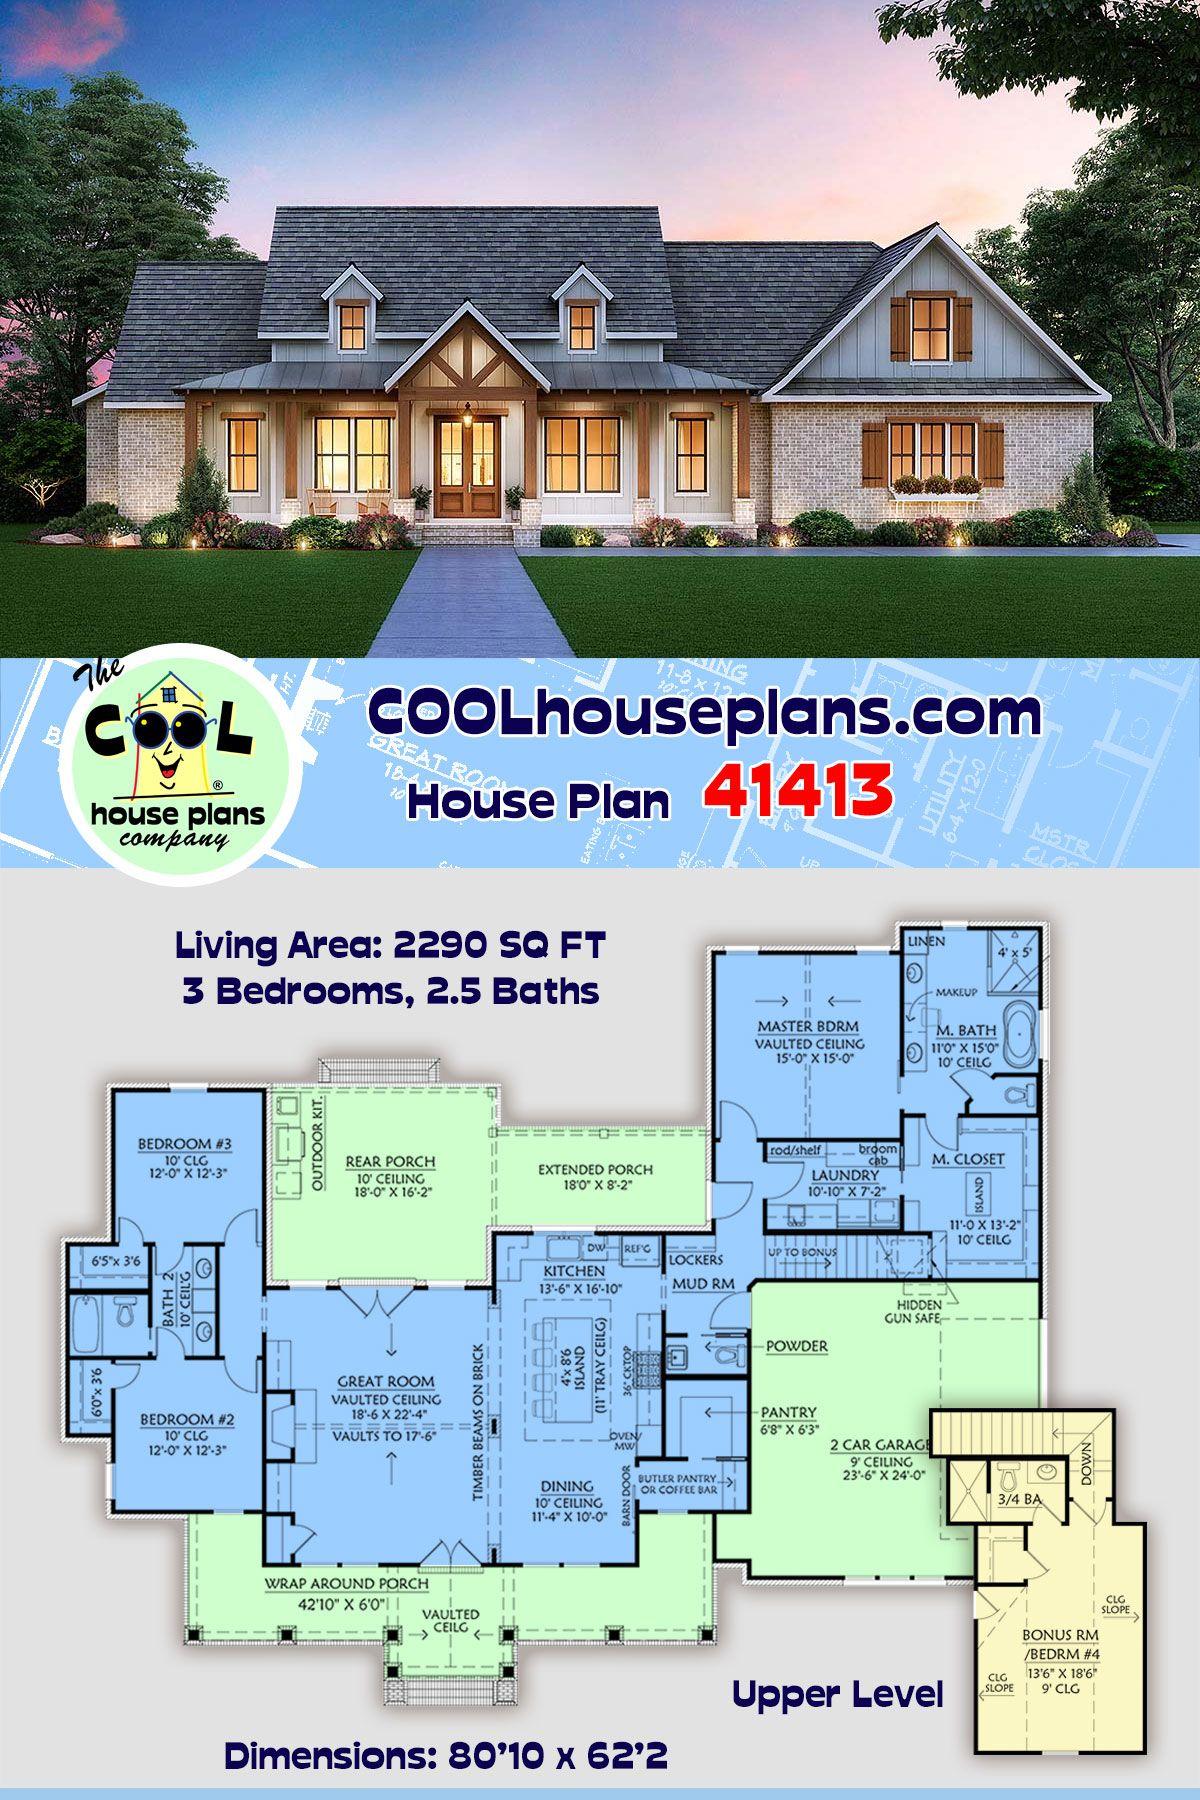 Farmhouse Style House Plan 41413 With 3 Bed 3 Bath 2 Car Garage Southern House Plans House Plans Farmhouse Craftsman Style House Plans